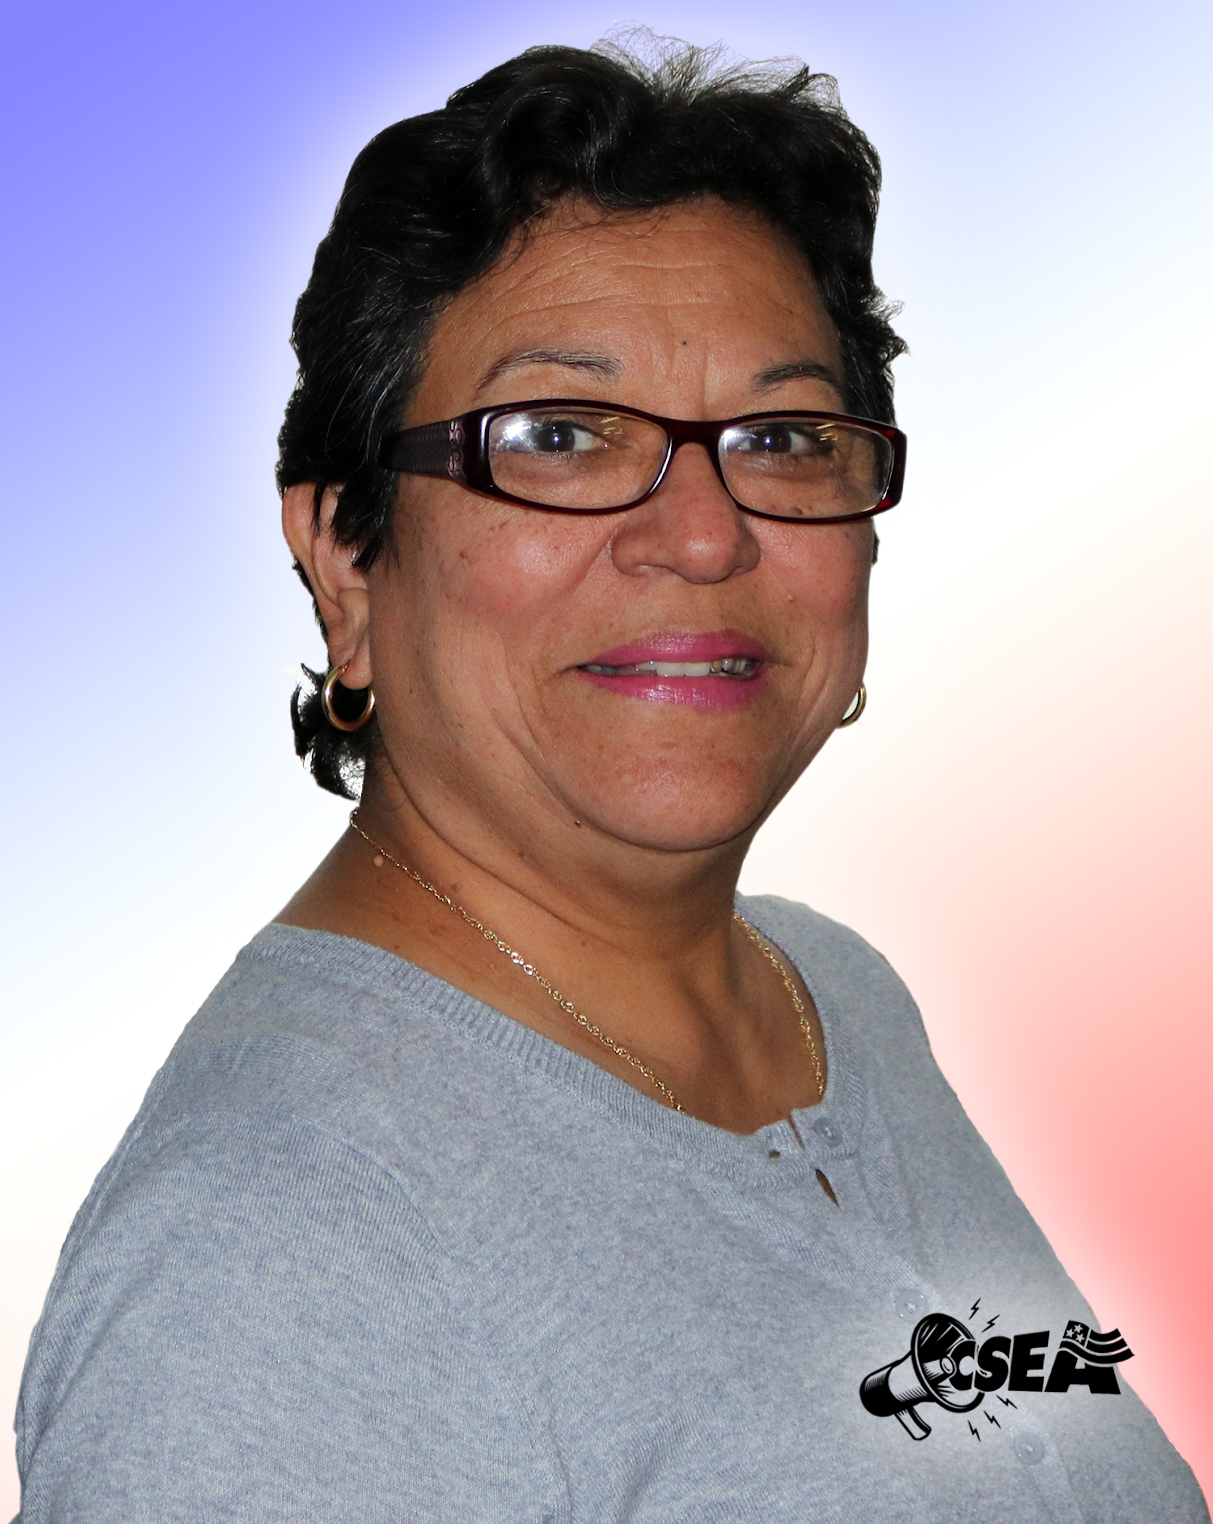 AnaO'Gorman - CSEA Local 830 Vice President • Nassau Community College Unit President